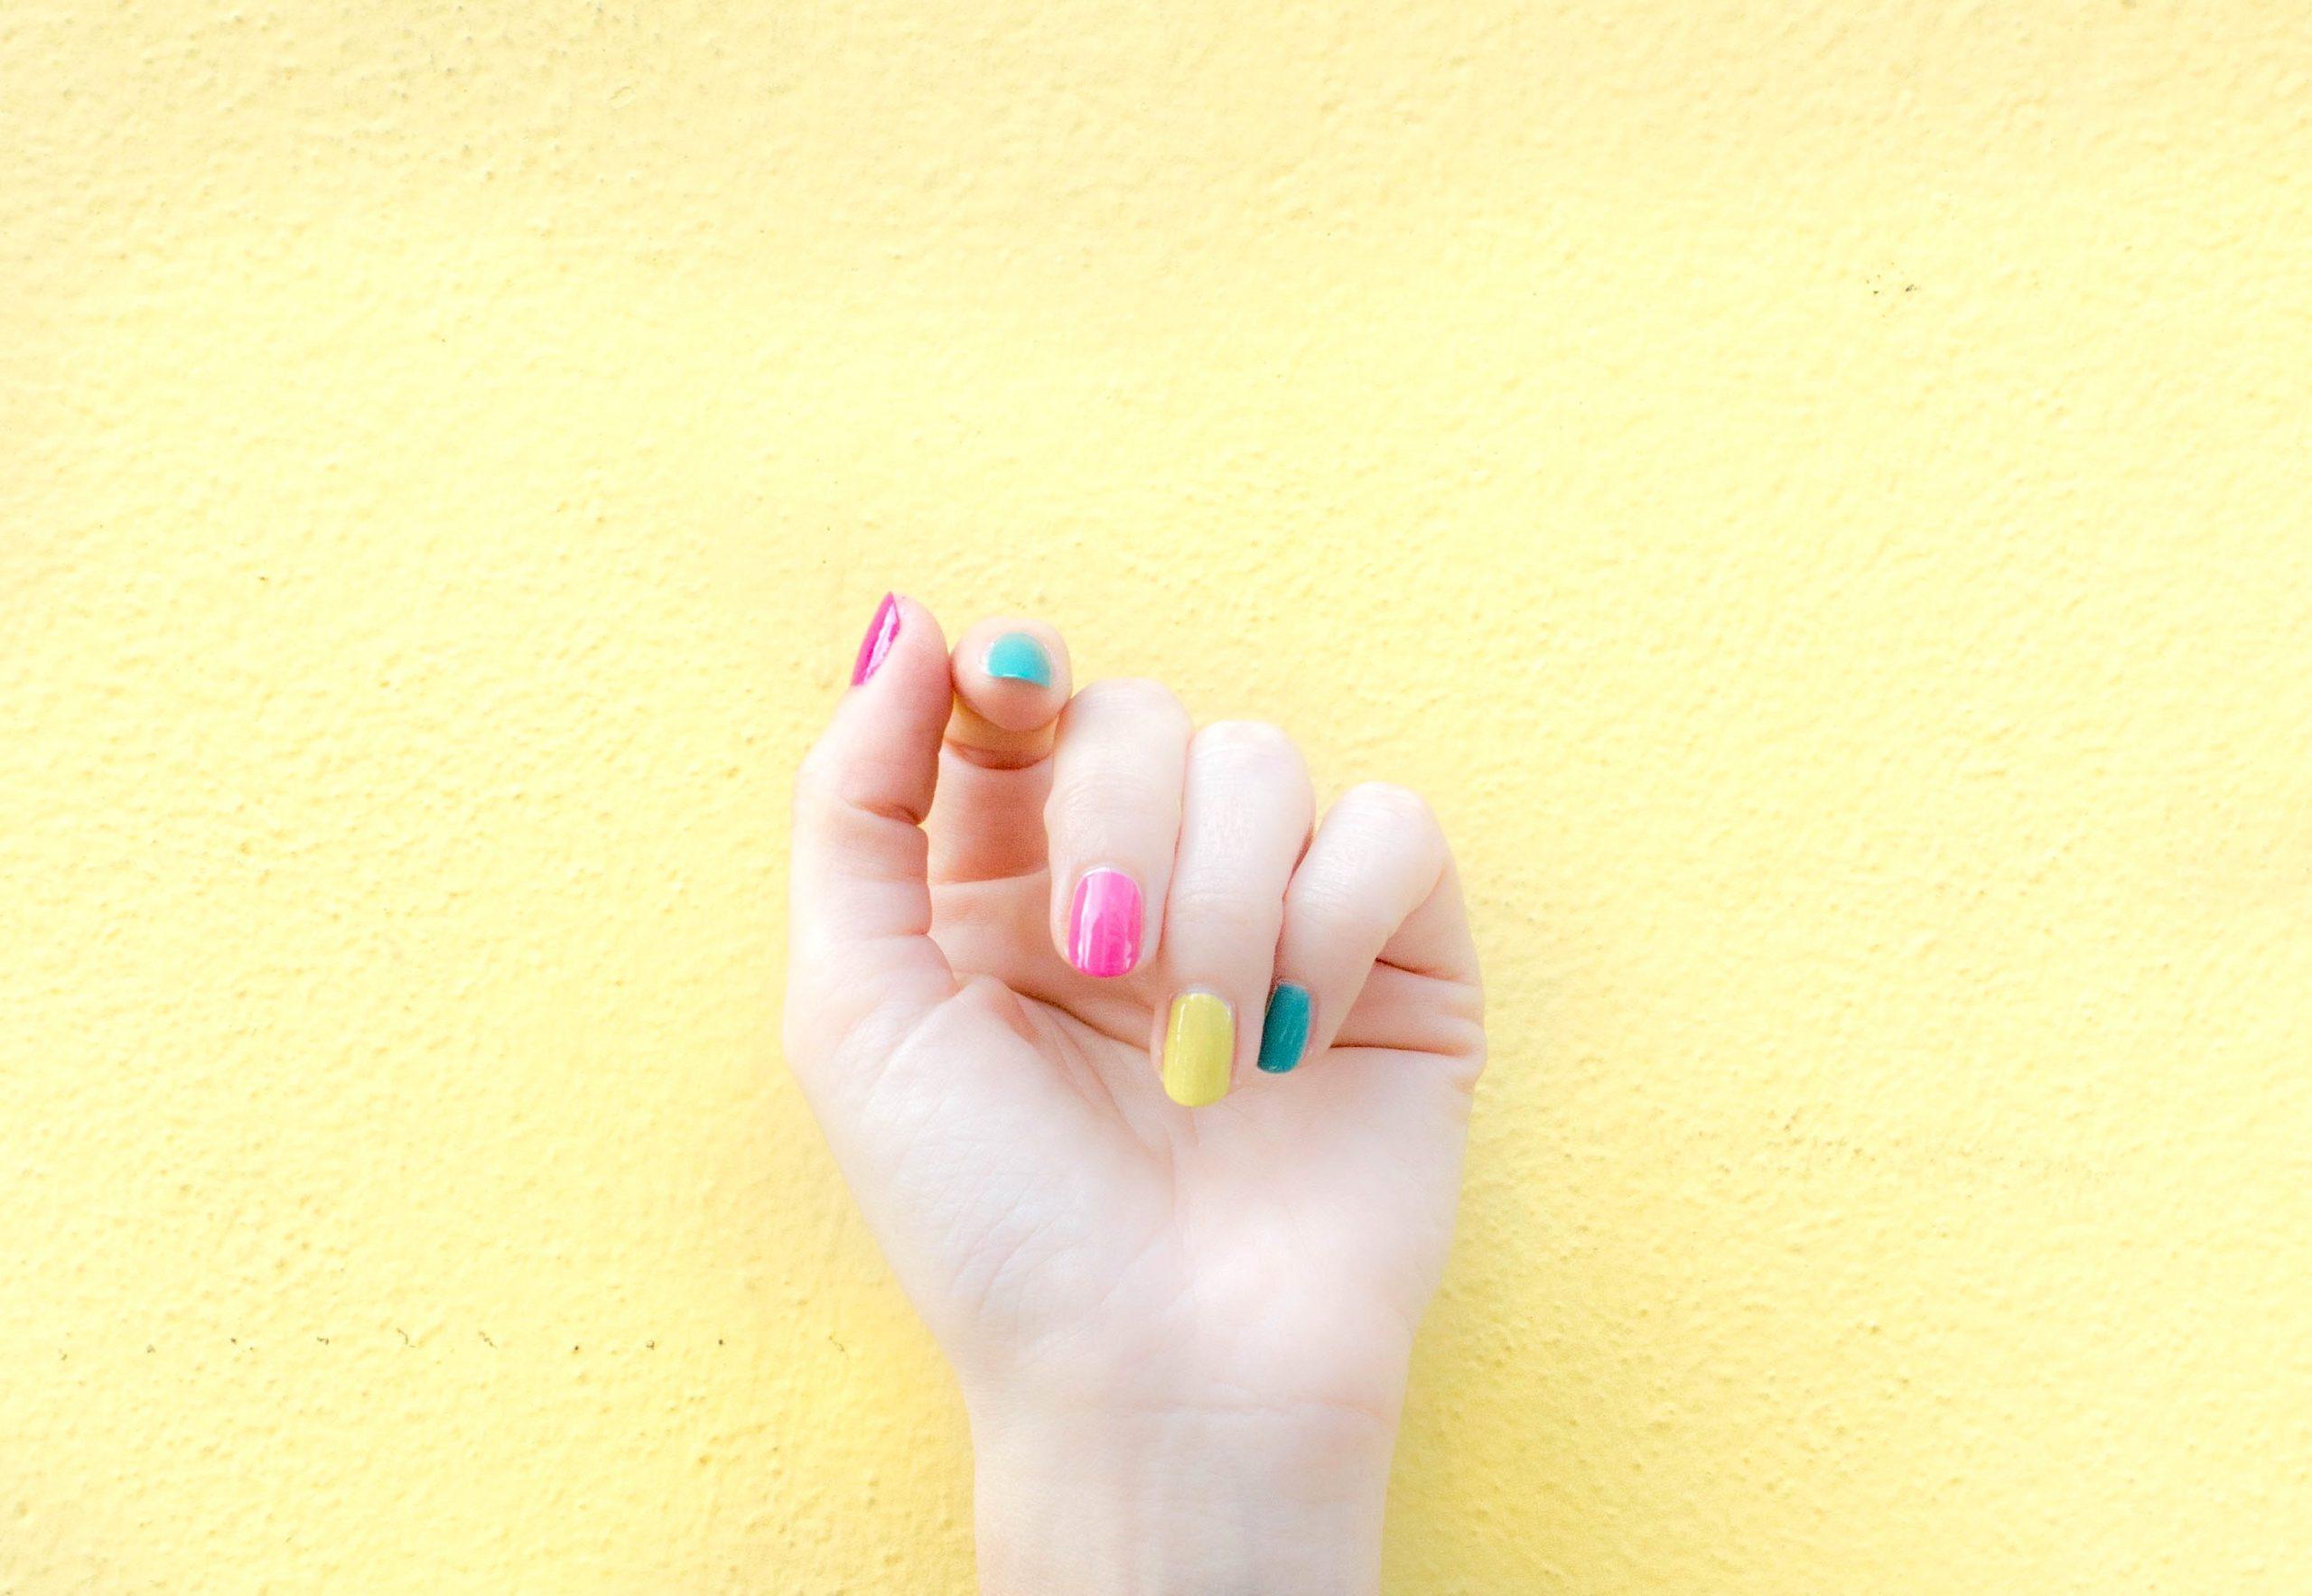 Rainbow nails: Η απόλυτη τάση στα νύχια απέκτησε όνομα